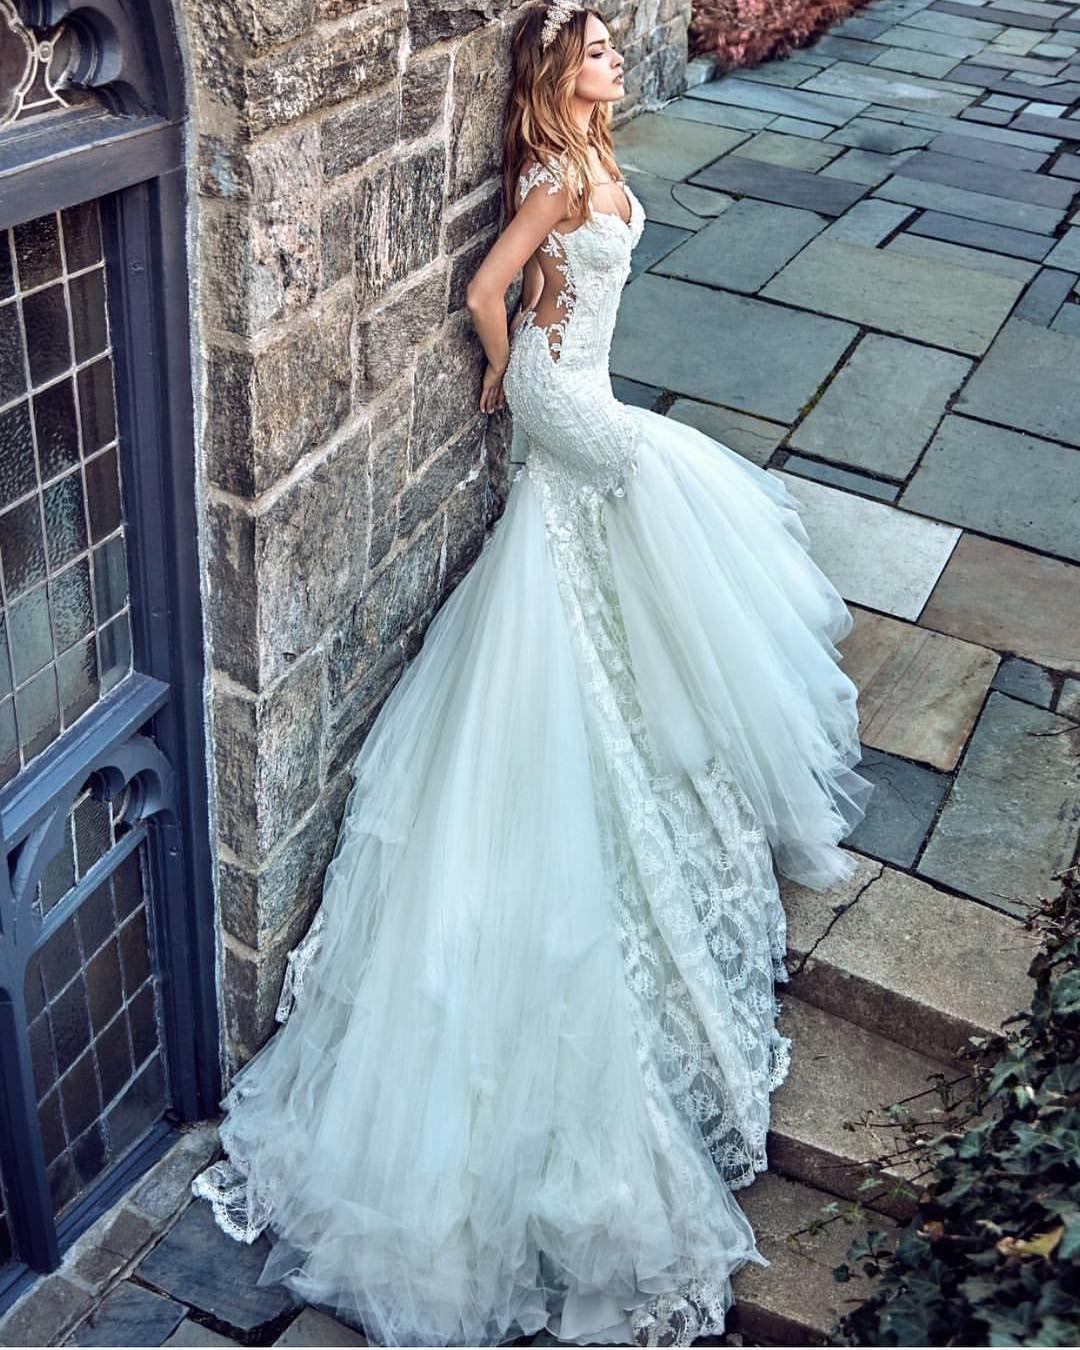 Pin de 💗 Raissa Chaddad 💖 en Casamento | Pinterest | Vestiditos ...